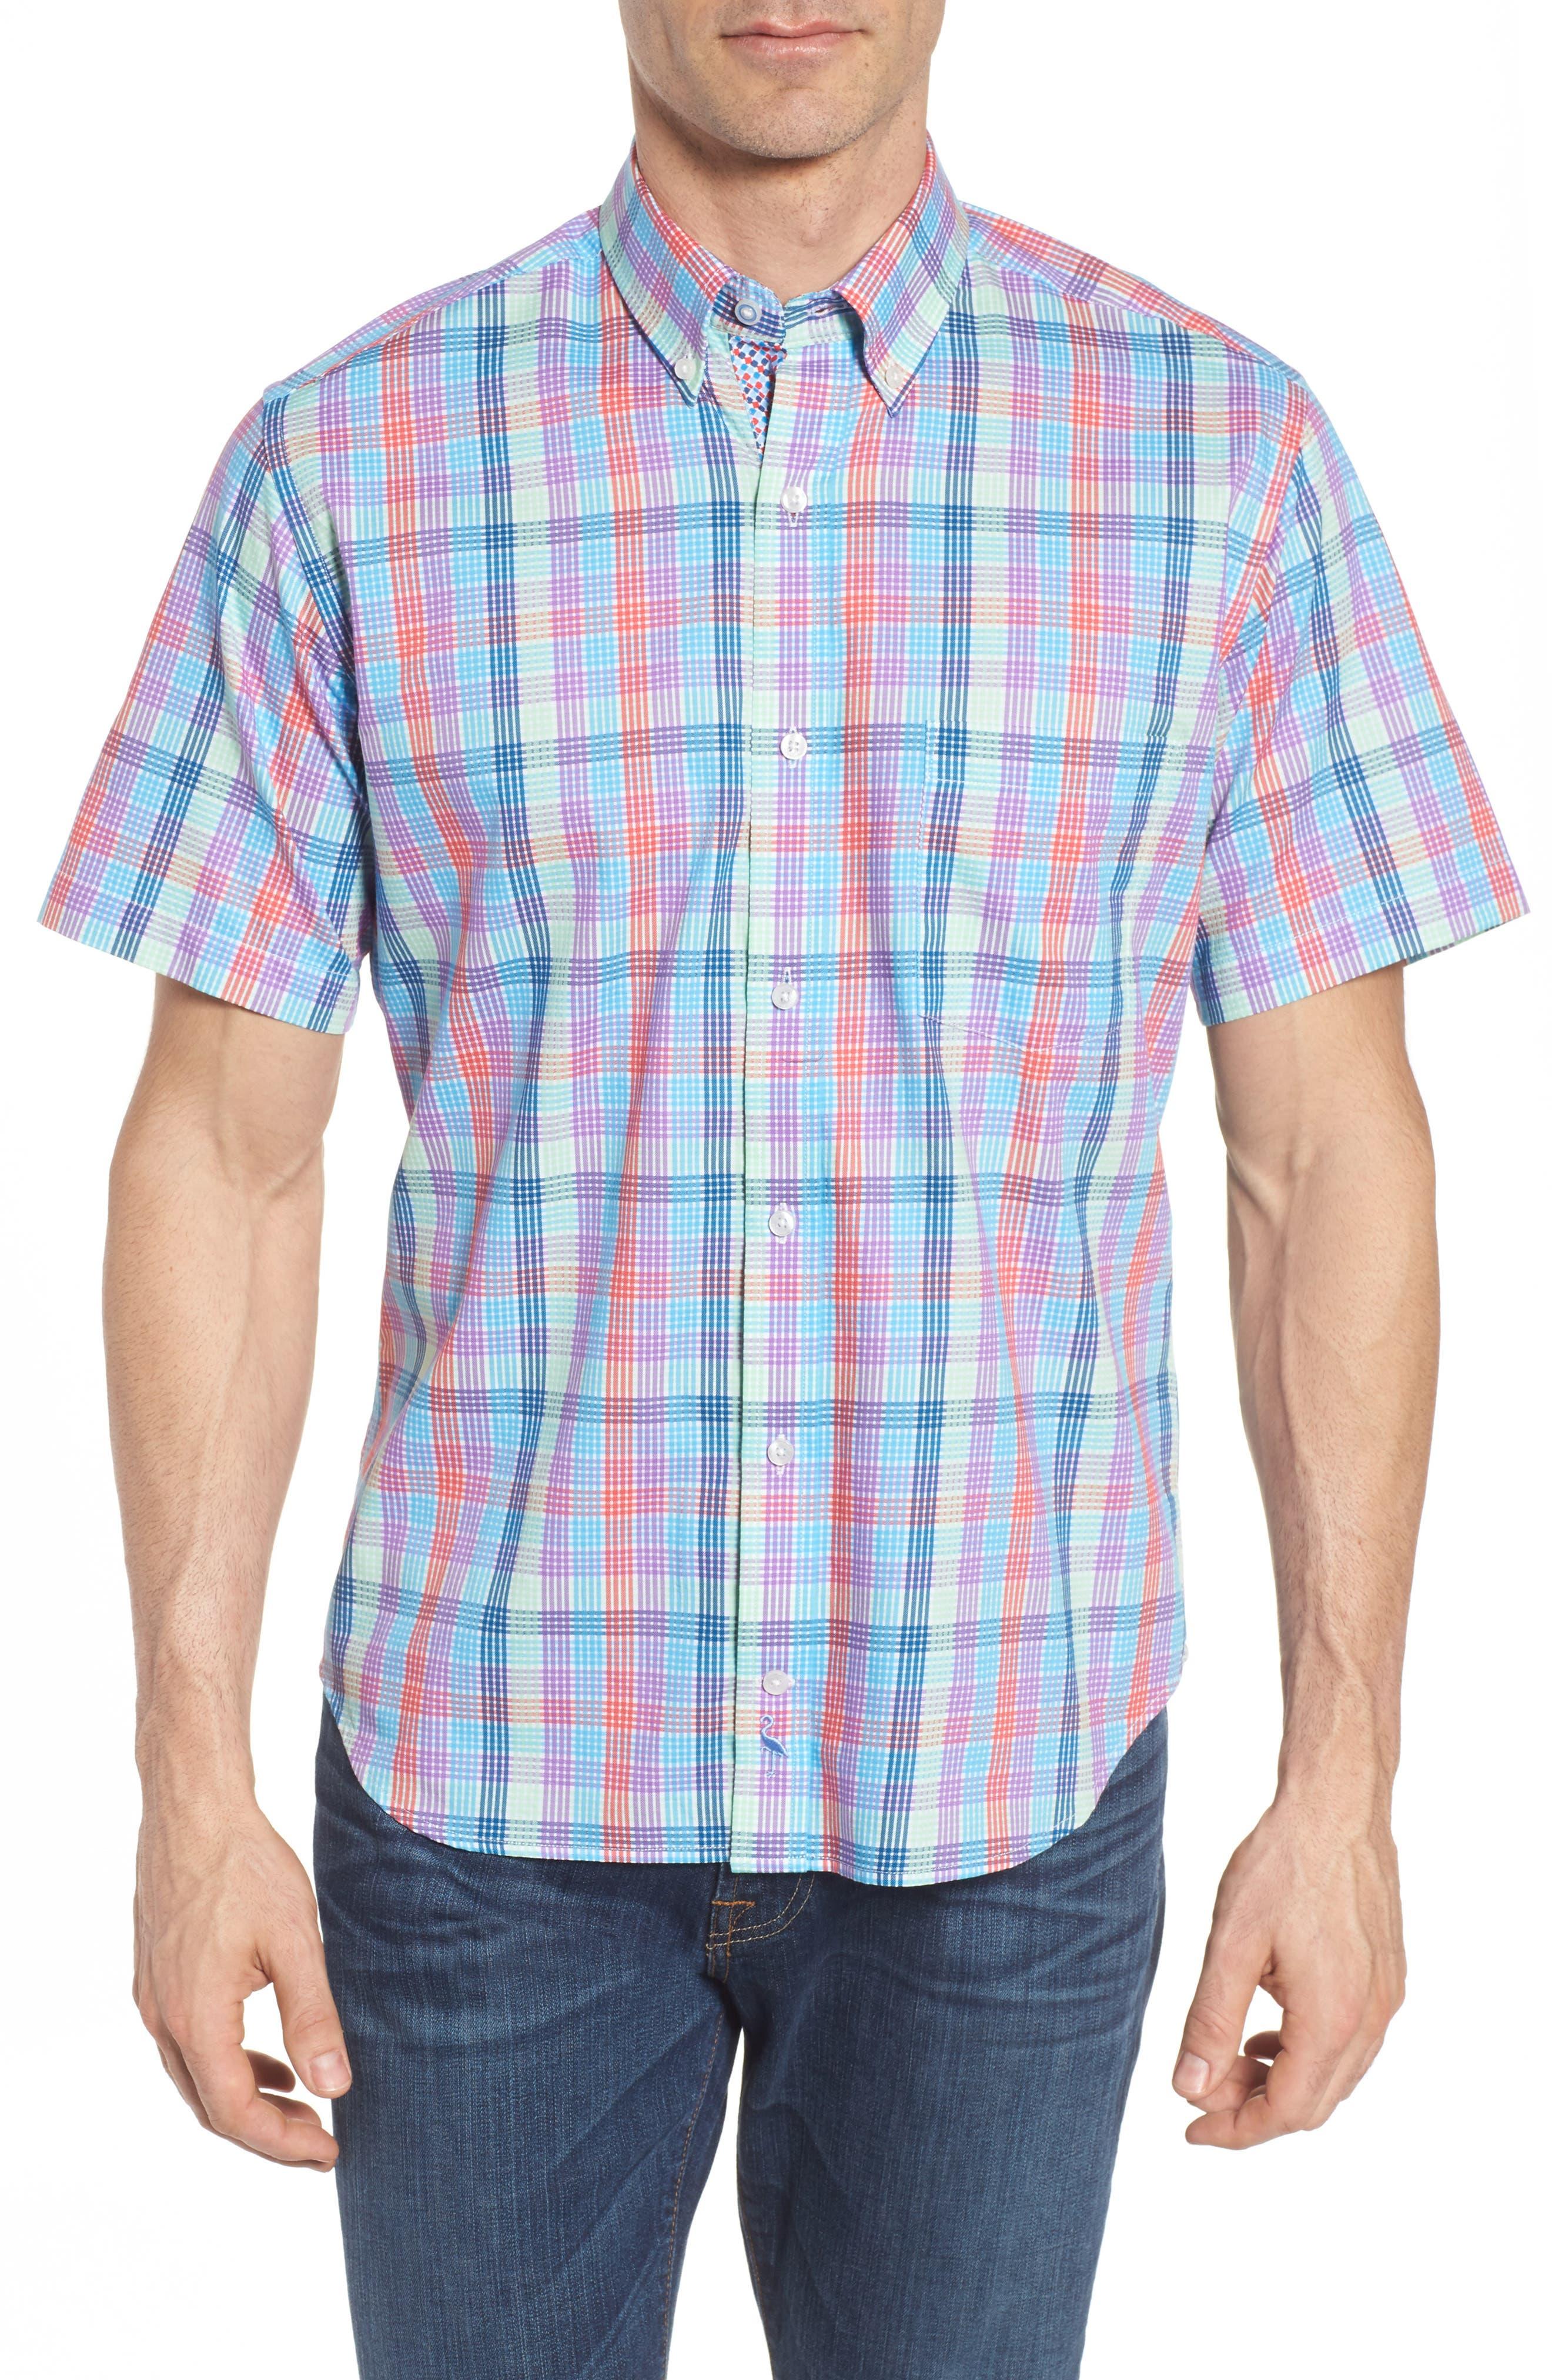 Slidell Regular Fit Check Sport Shirt,                         Main,                         color, Aqua